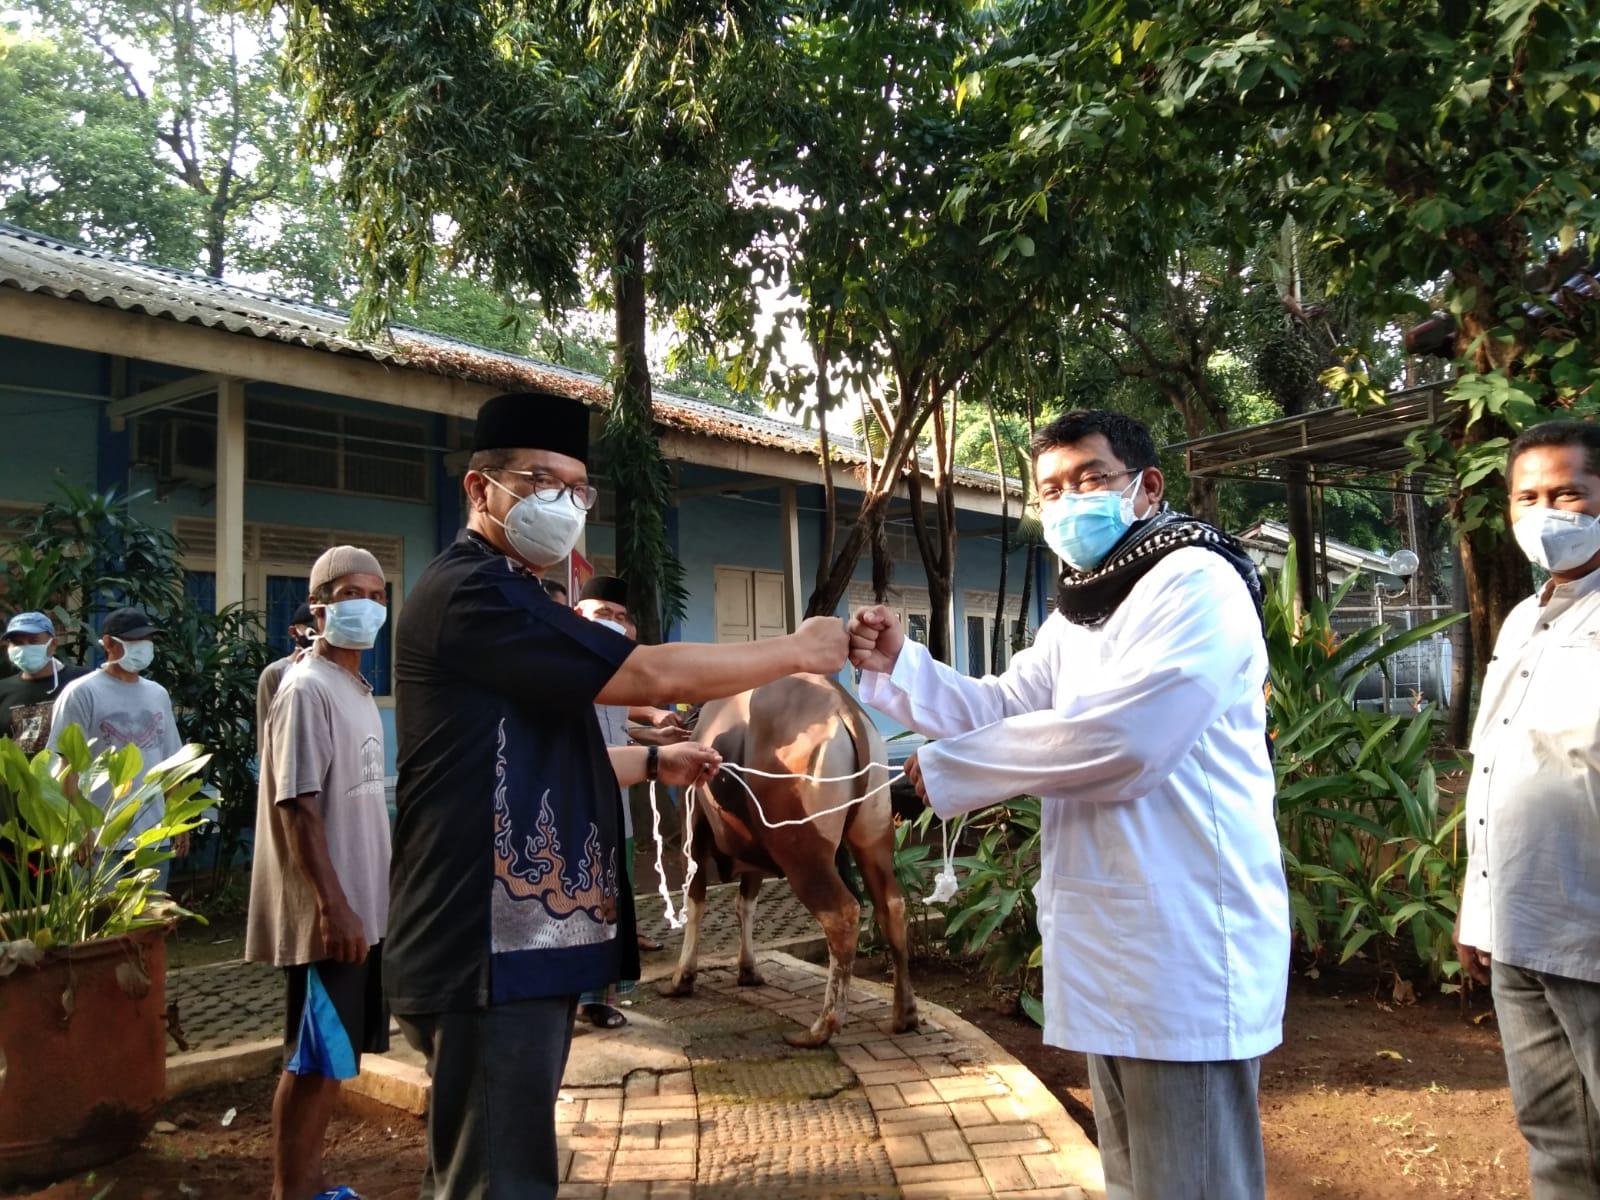 Peringatan Hari Raya Idul Adha 1442 H RSUP Persahabatan Di Tengah Pandemi Covid- 19